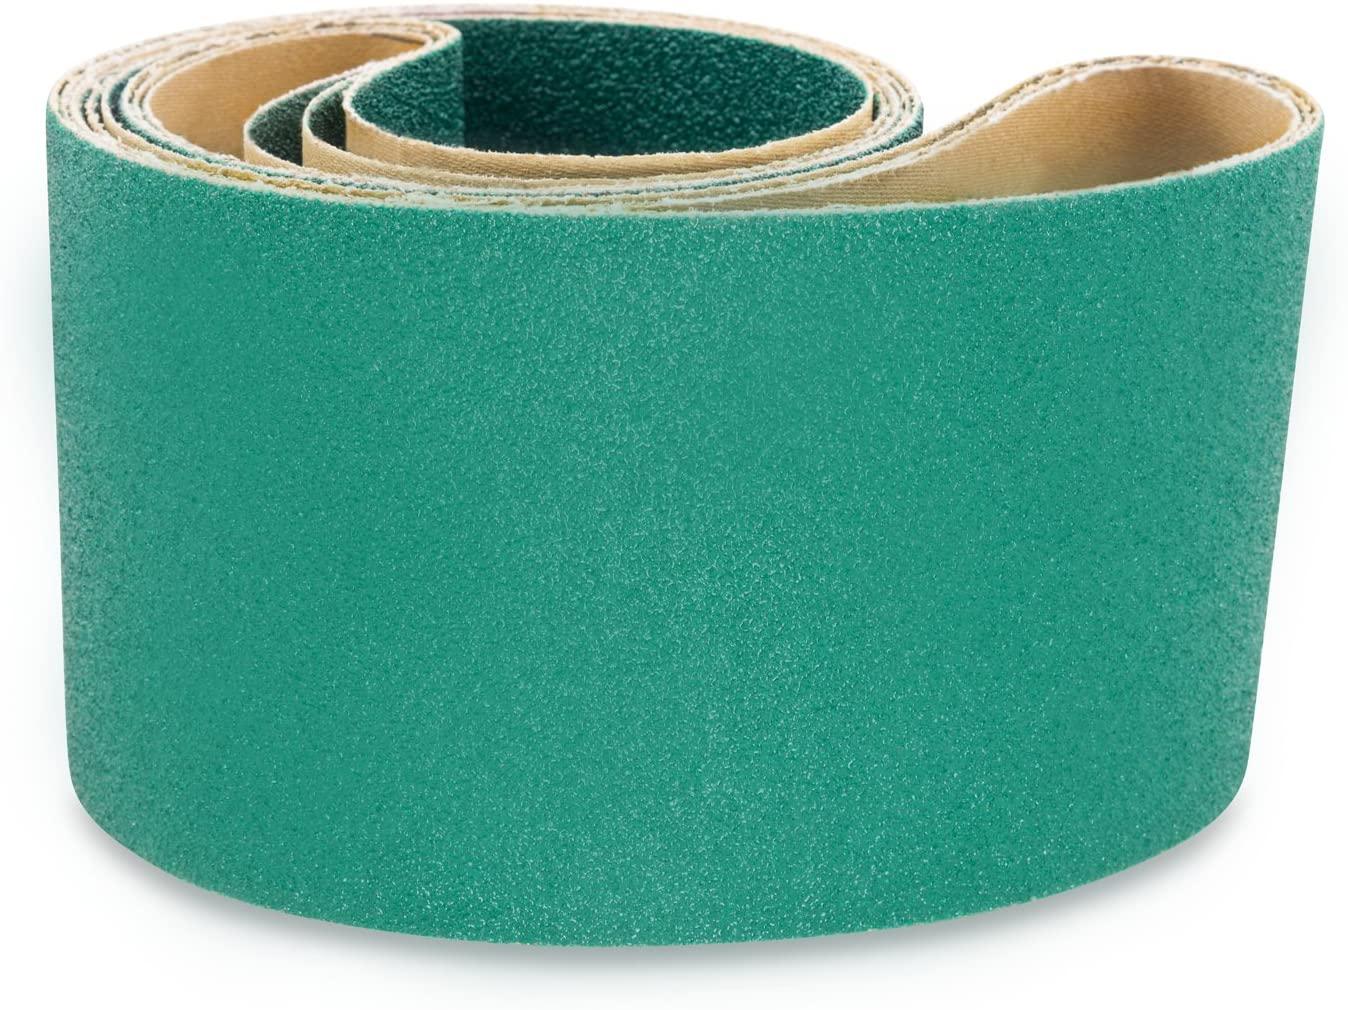 Red Label Abrasives 4 X 54 Inch 120 Grit Metal Grinding Zirconia Sanding Belts, 3 Pack